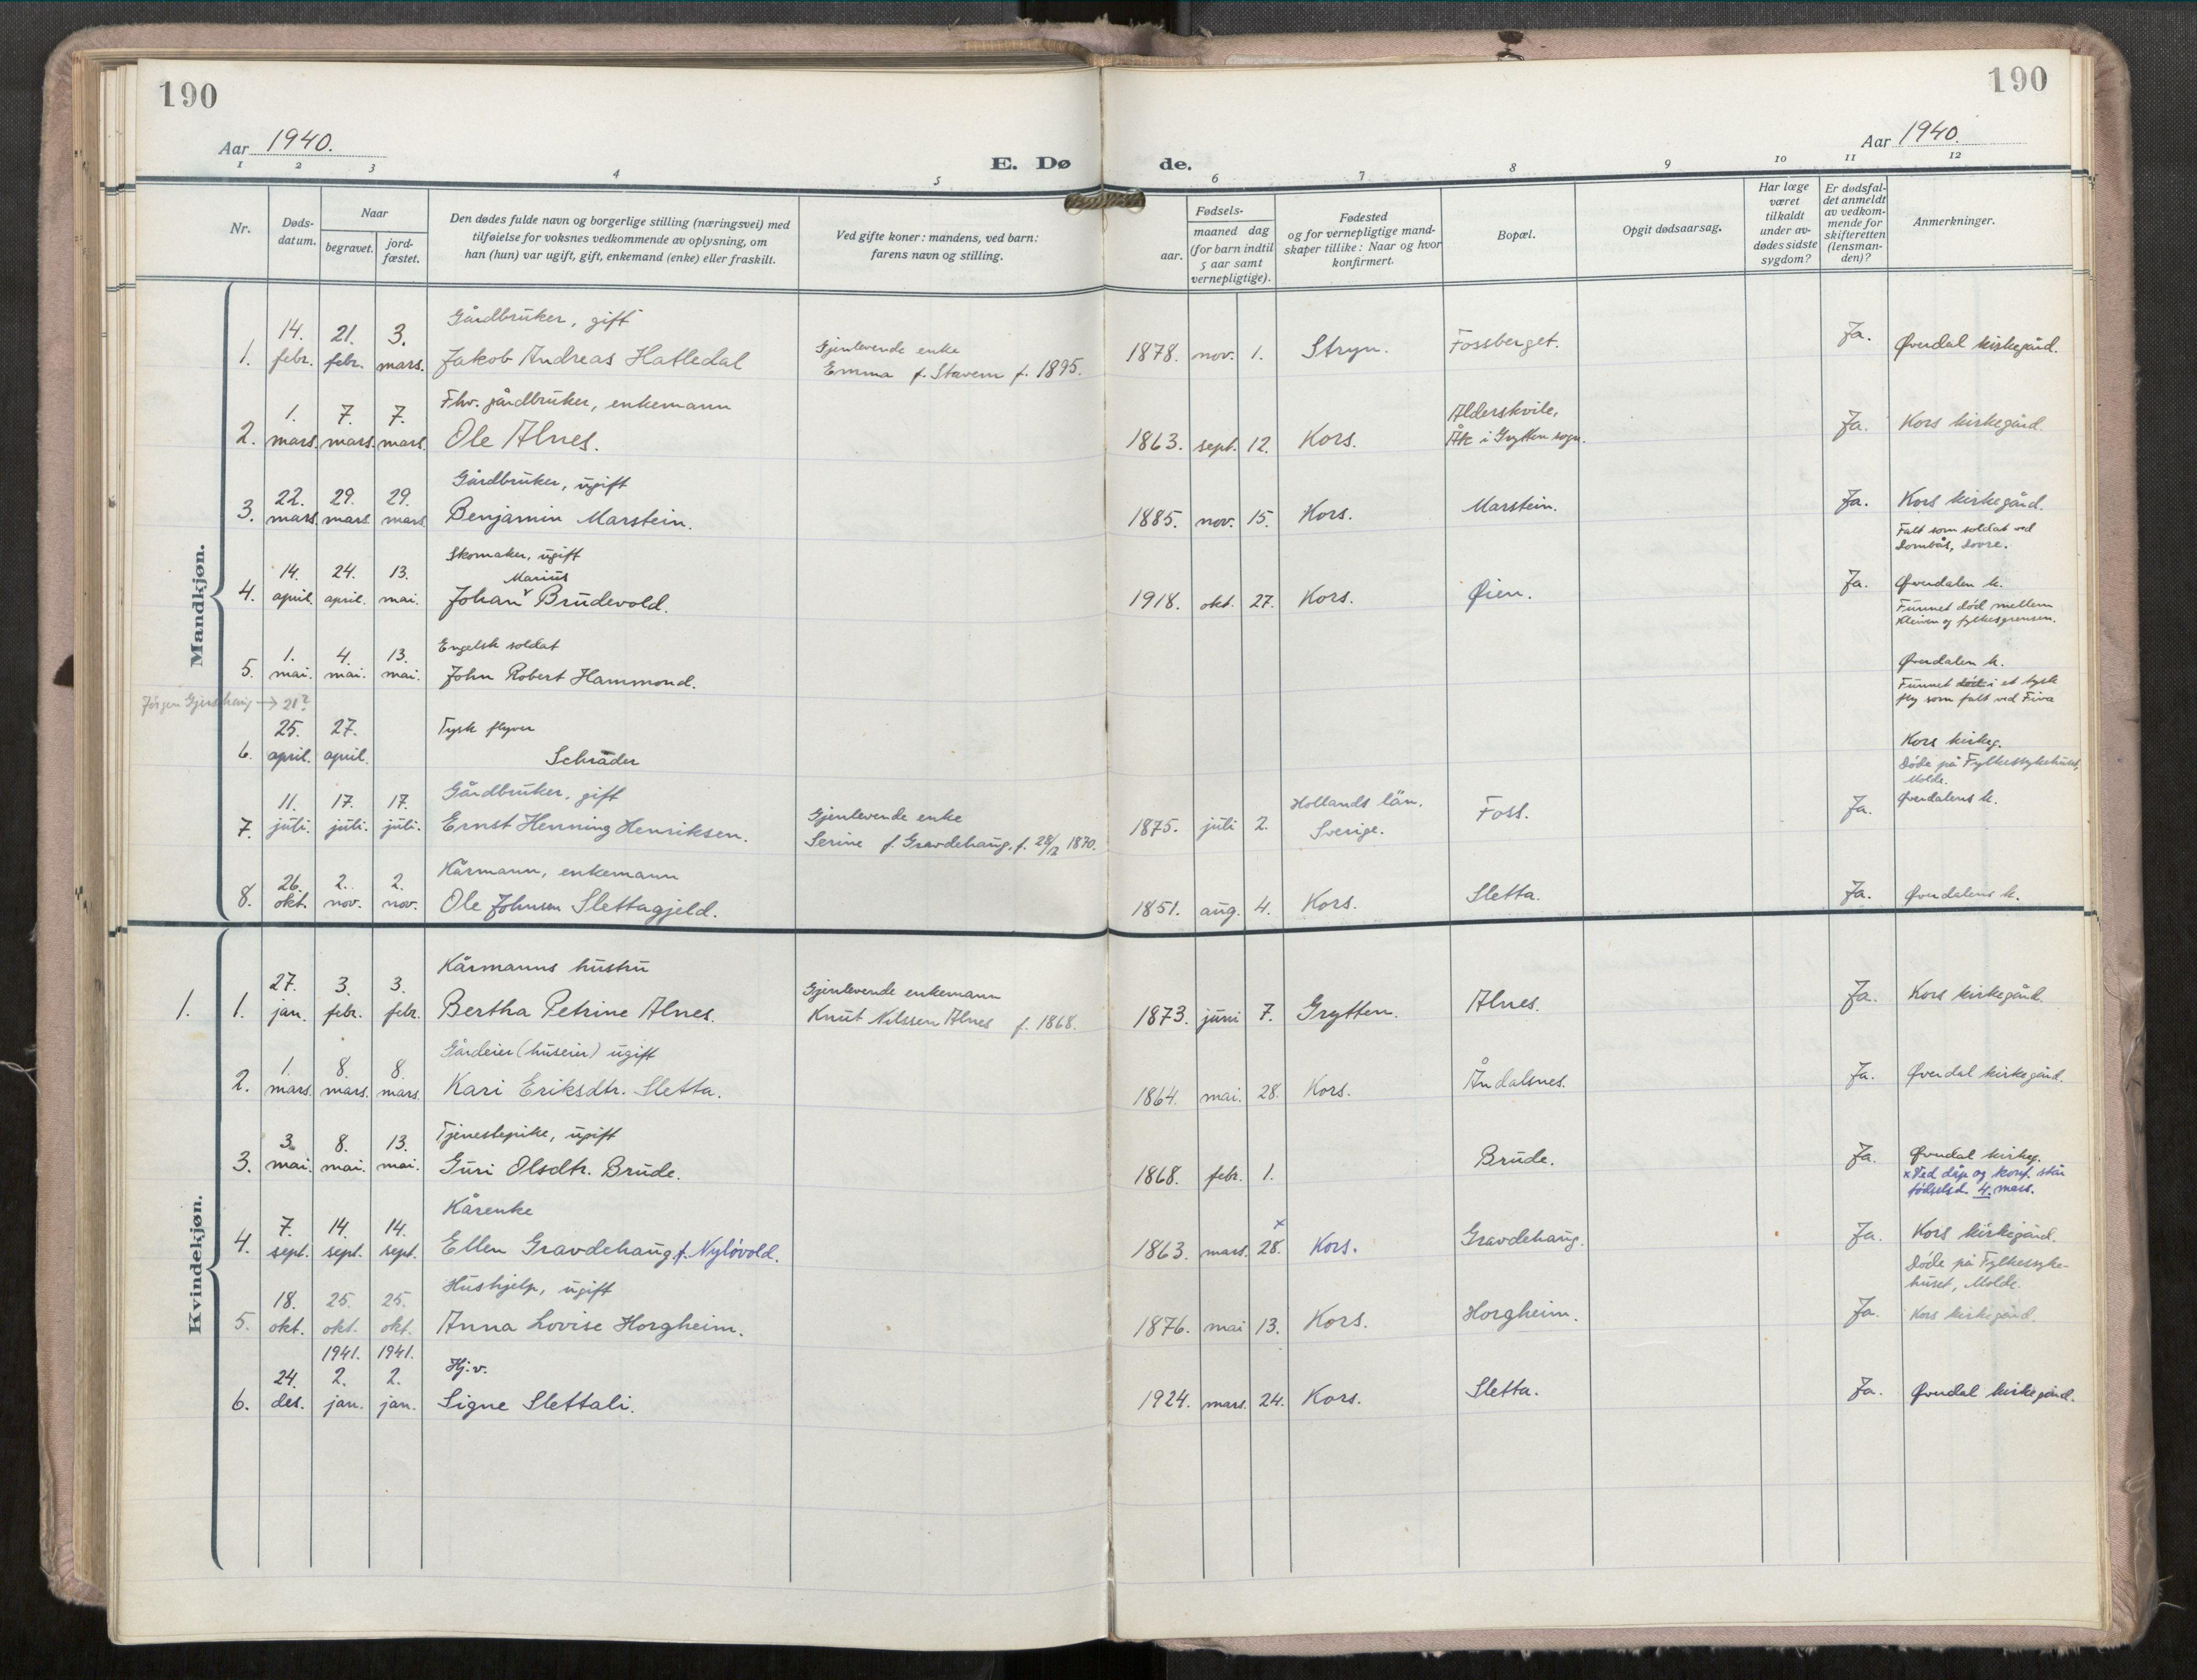 SAT, Grytten sokneprestkontor, Ministerialbok nr. 546A04, 1919-1956, s. 190